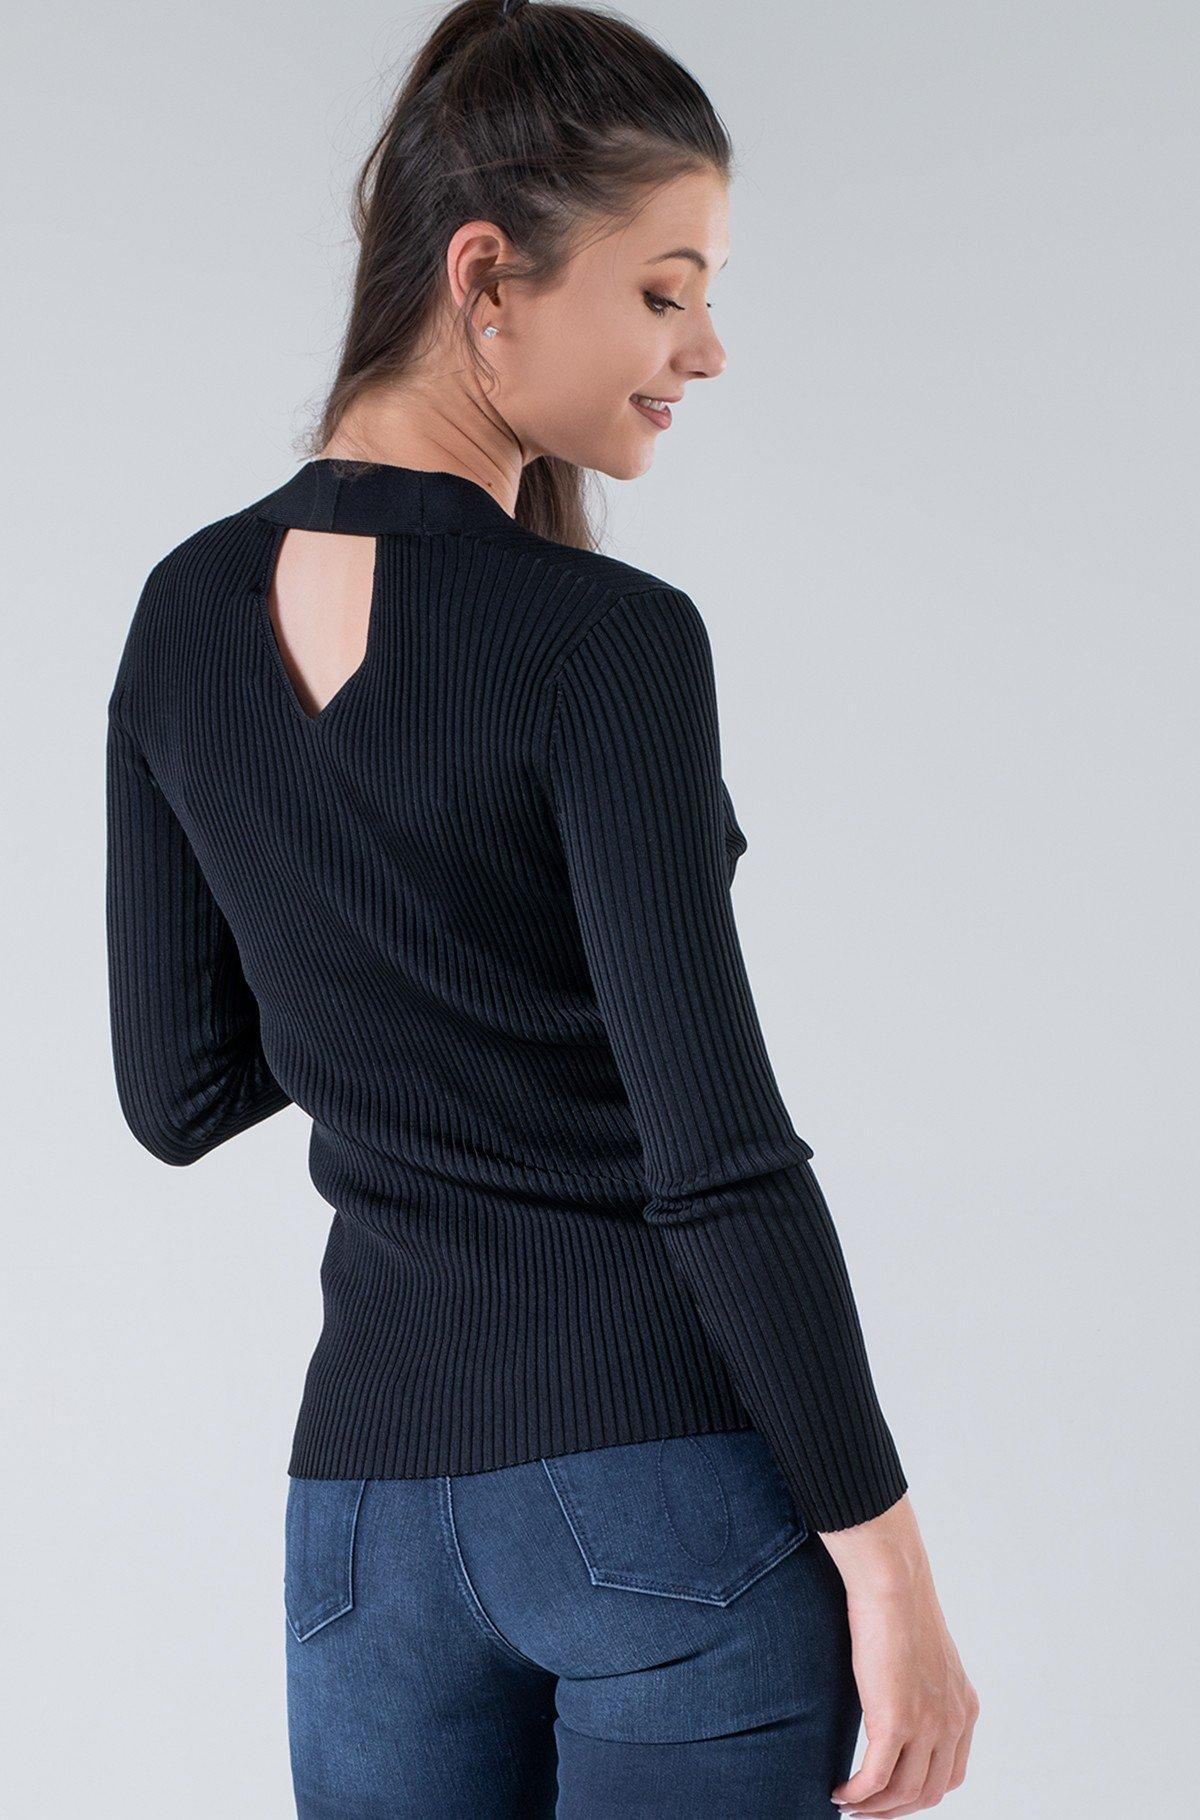 Knitwear ICONIC RIB V-NECK SWEATER-full-2